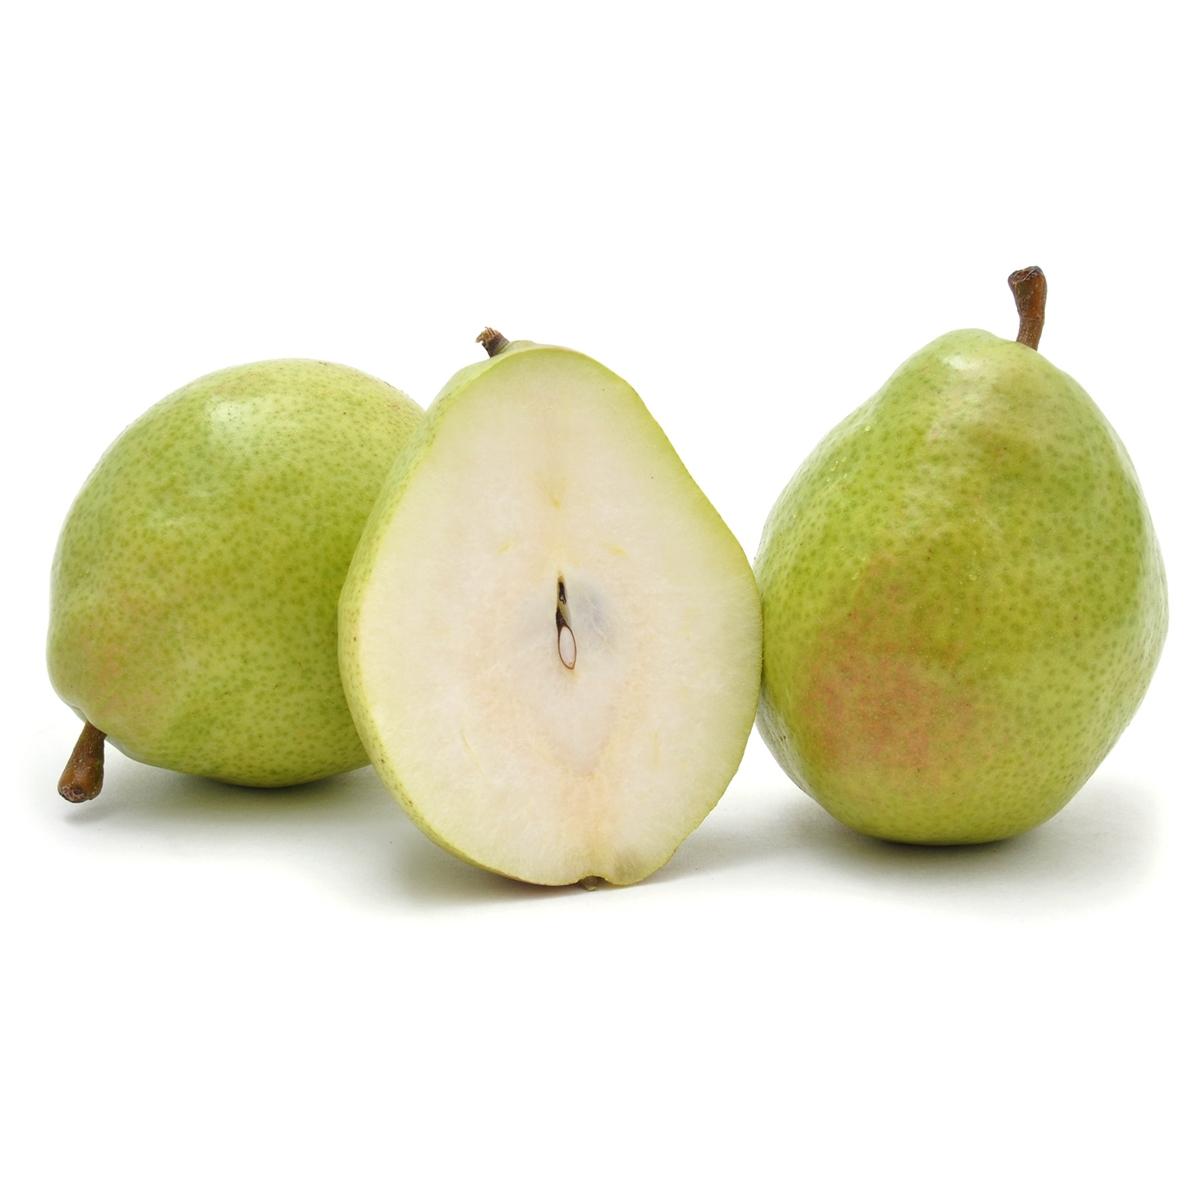 Green D'Anjou pears $1.79/lb -